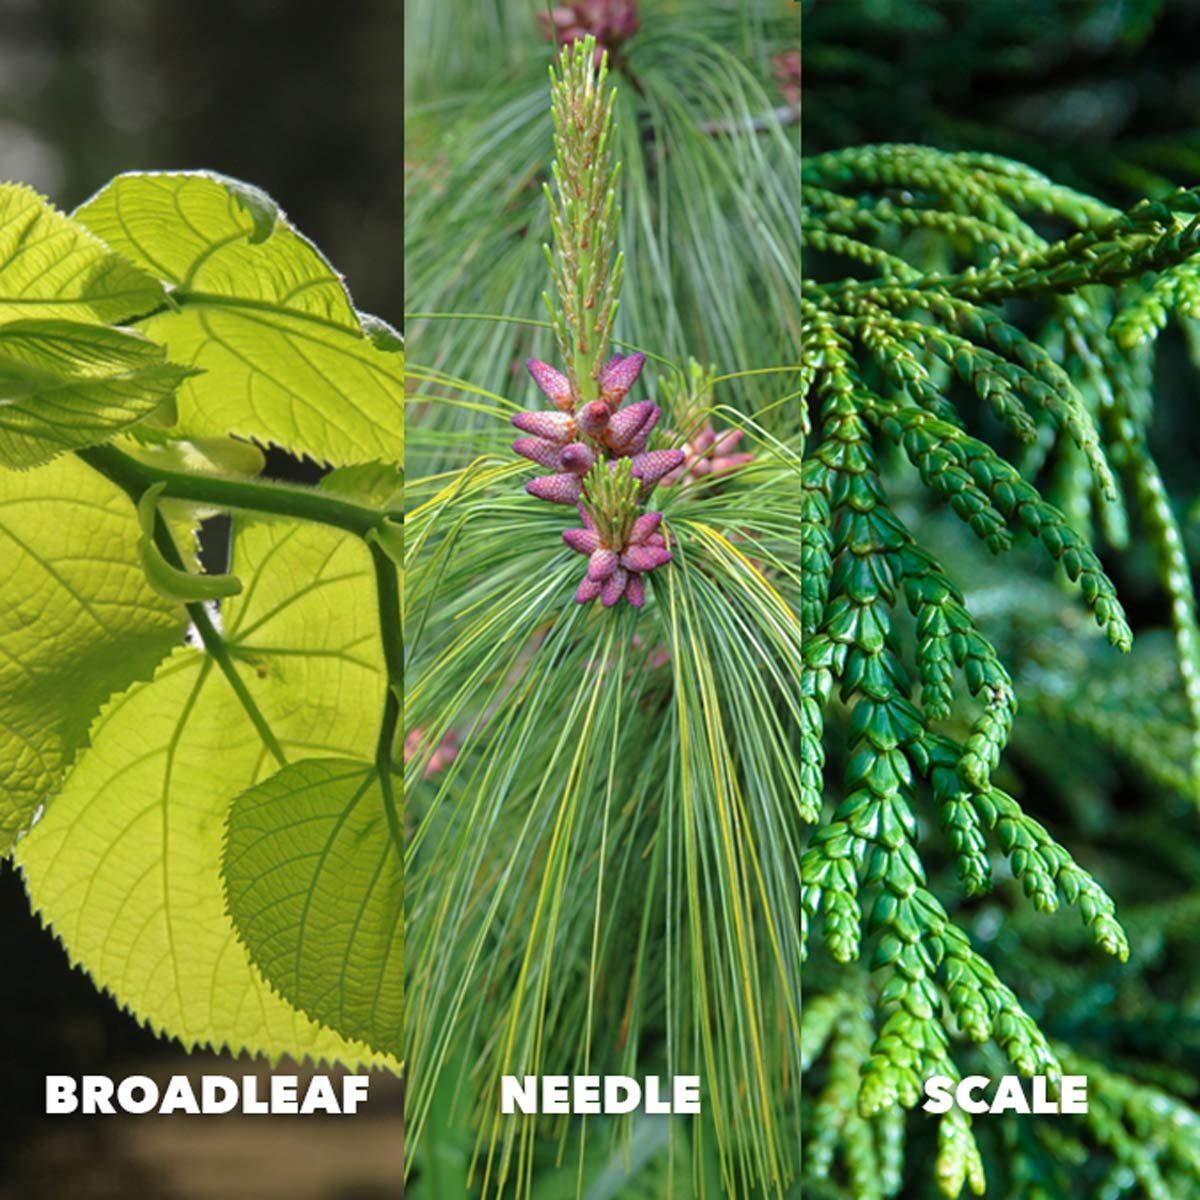 broadleaf needle scale leaf identification